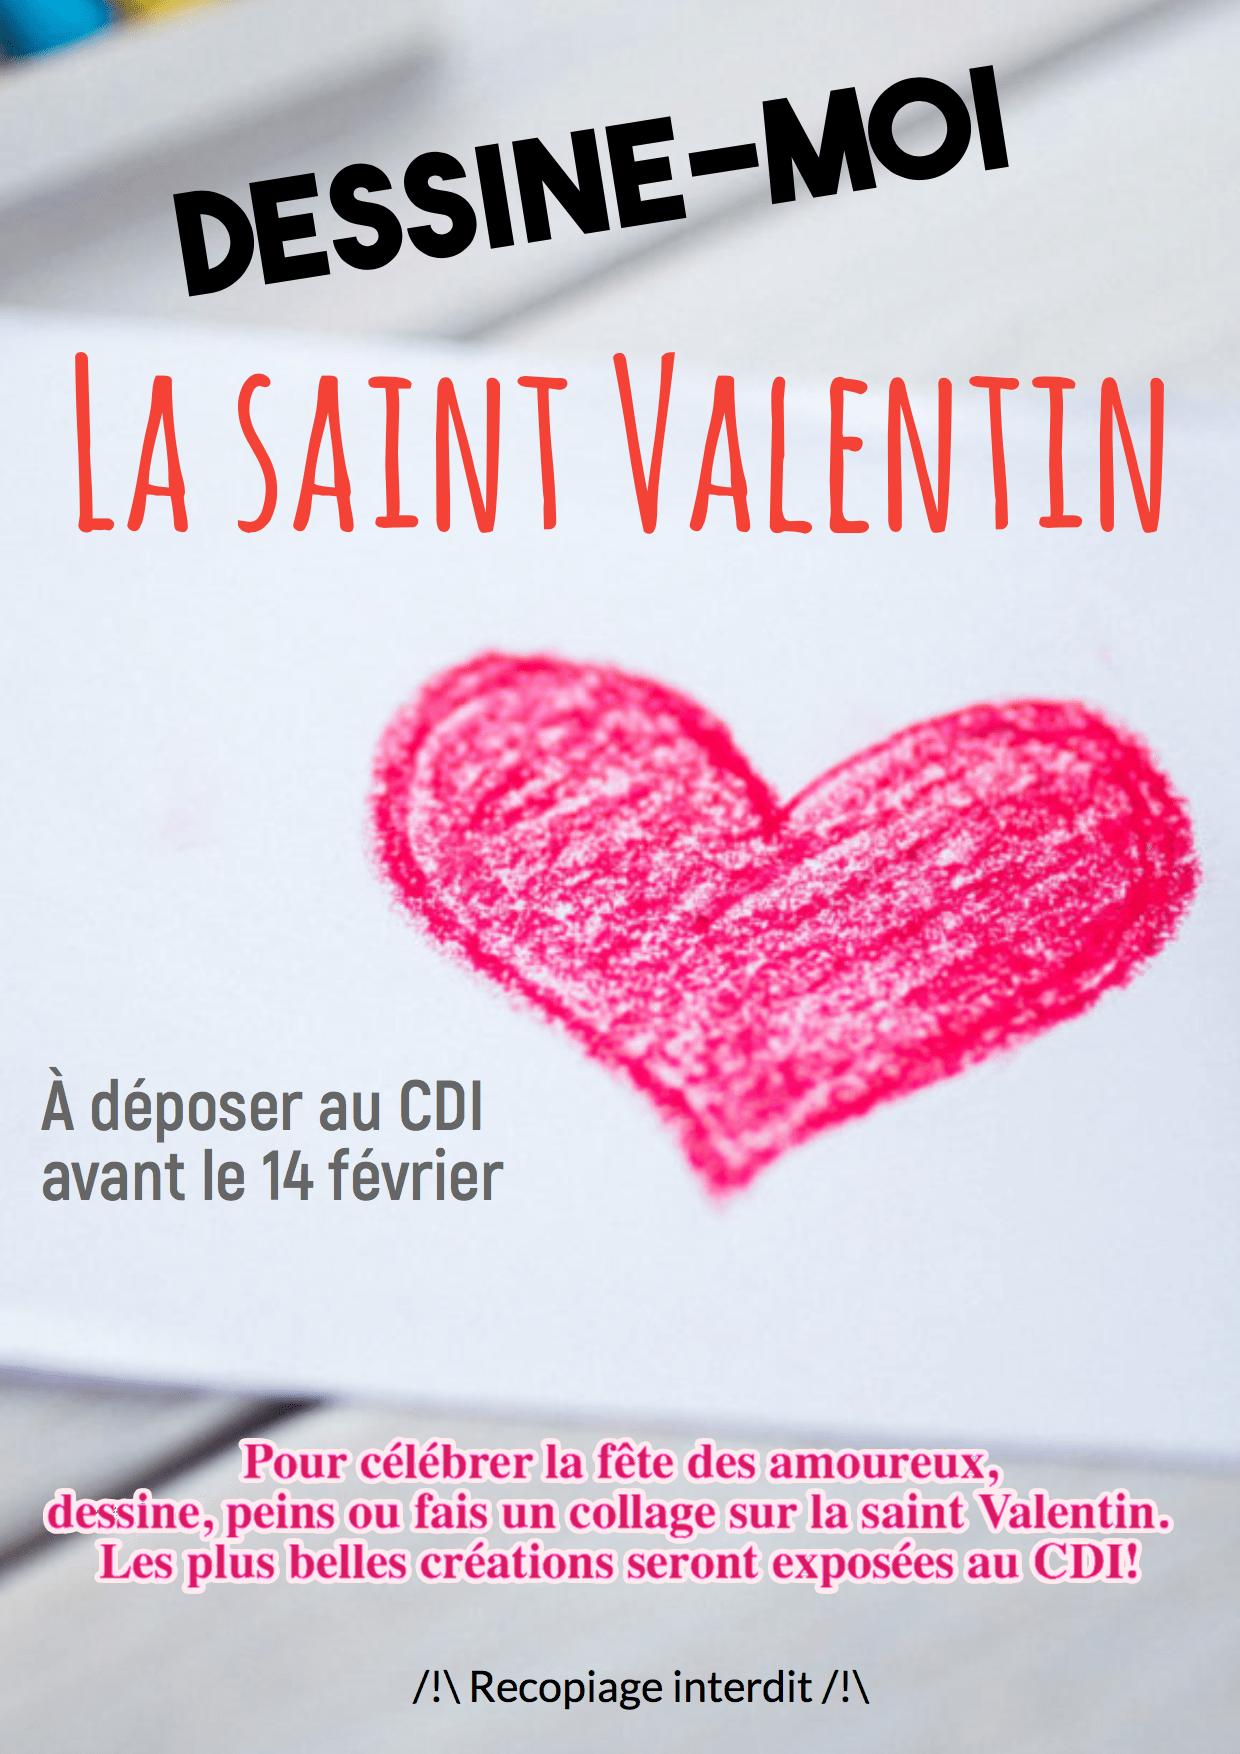 CDI,                Valentin,                Love,                White,                 Free Image